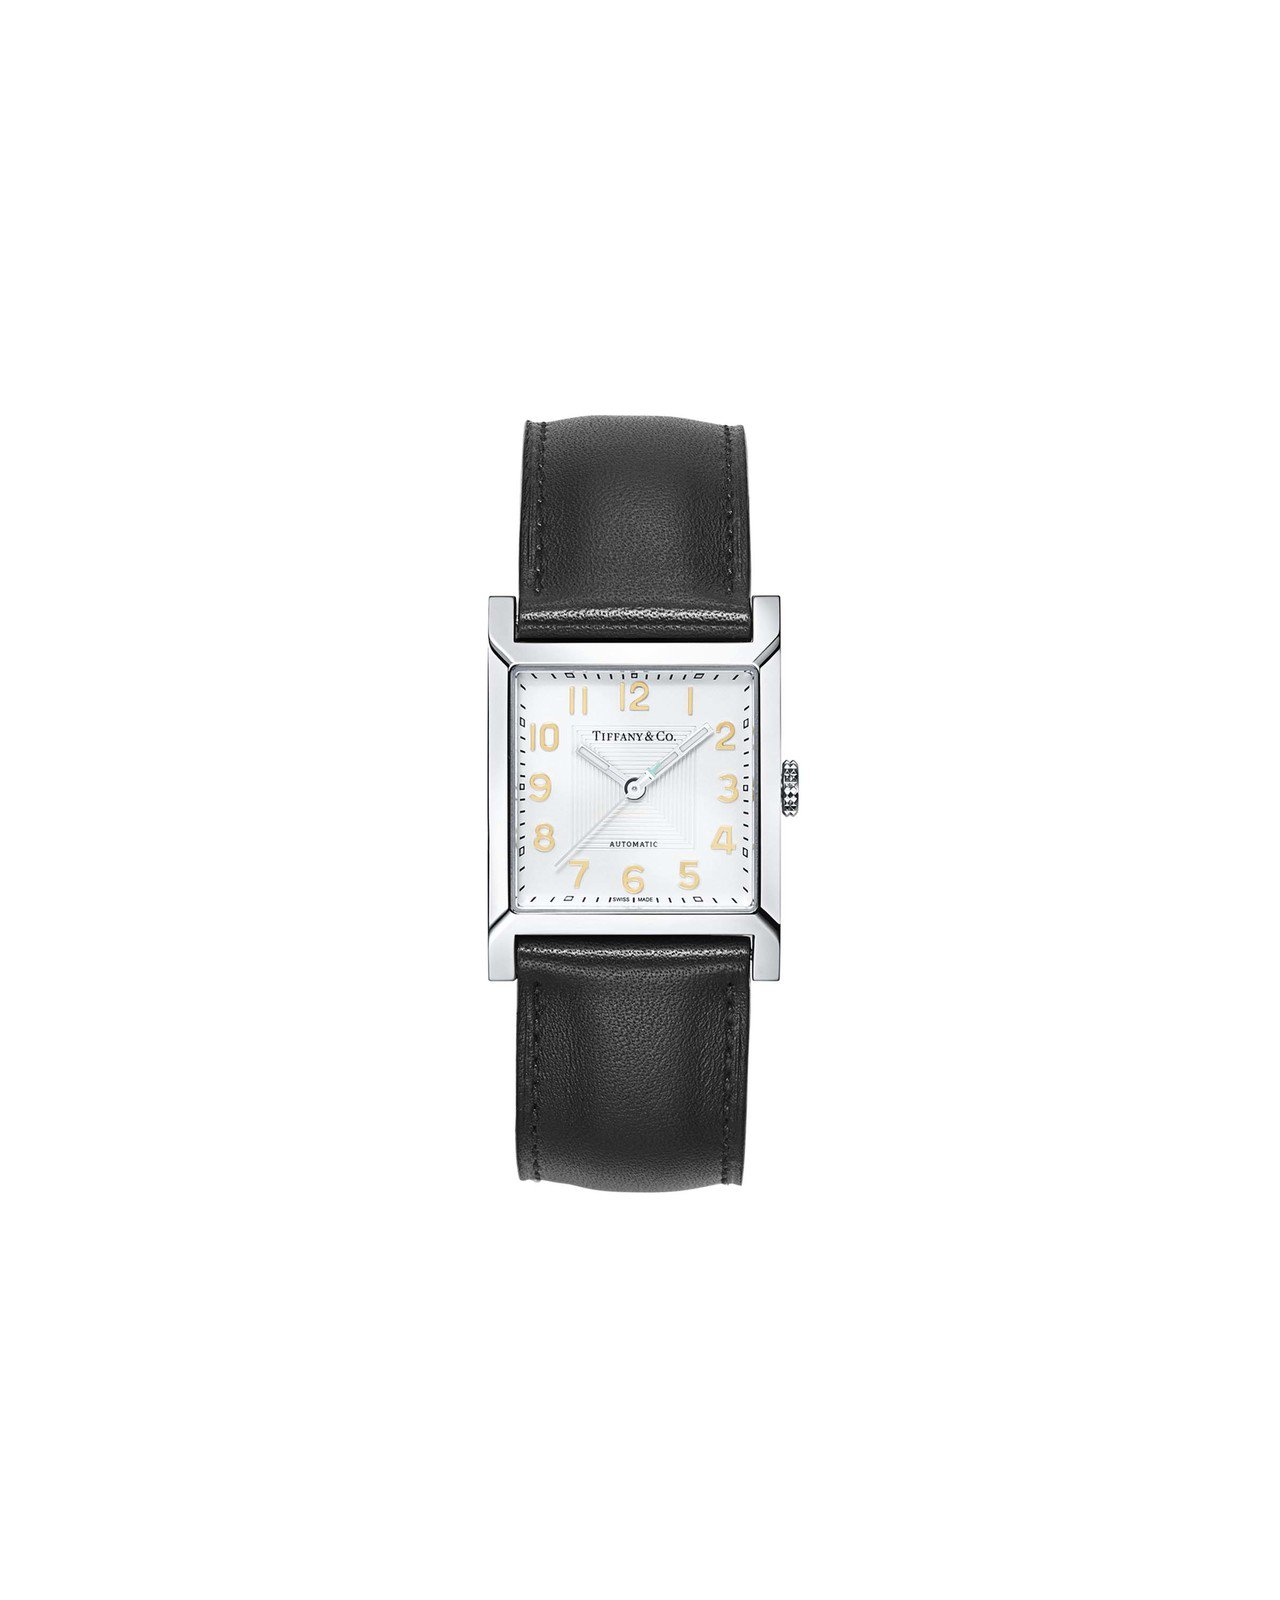 Tiffany 1837 Makers系列方形皮革表帶腕表,約99,000元。圖...